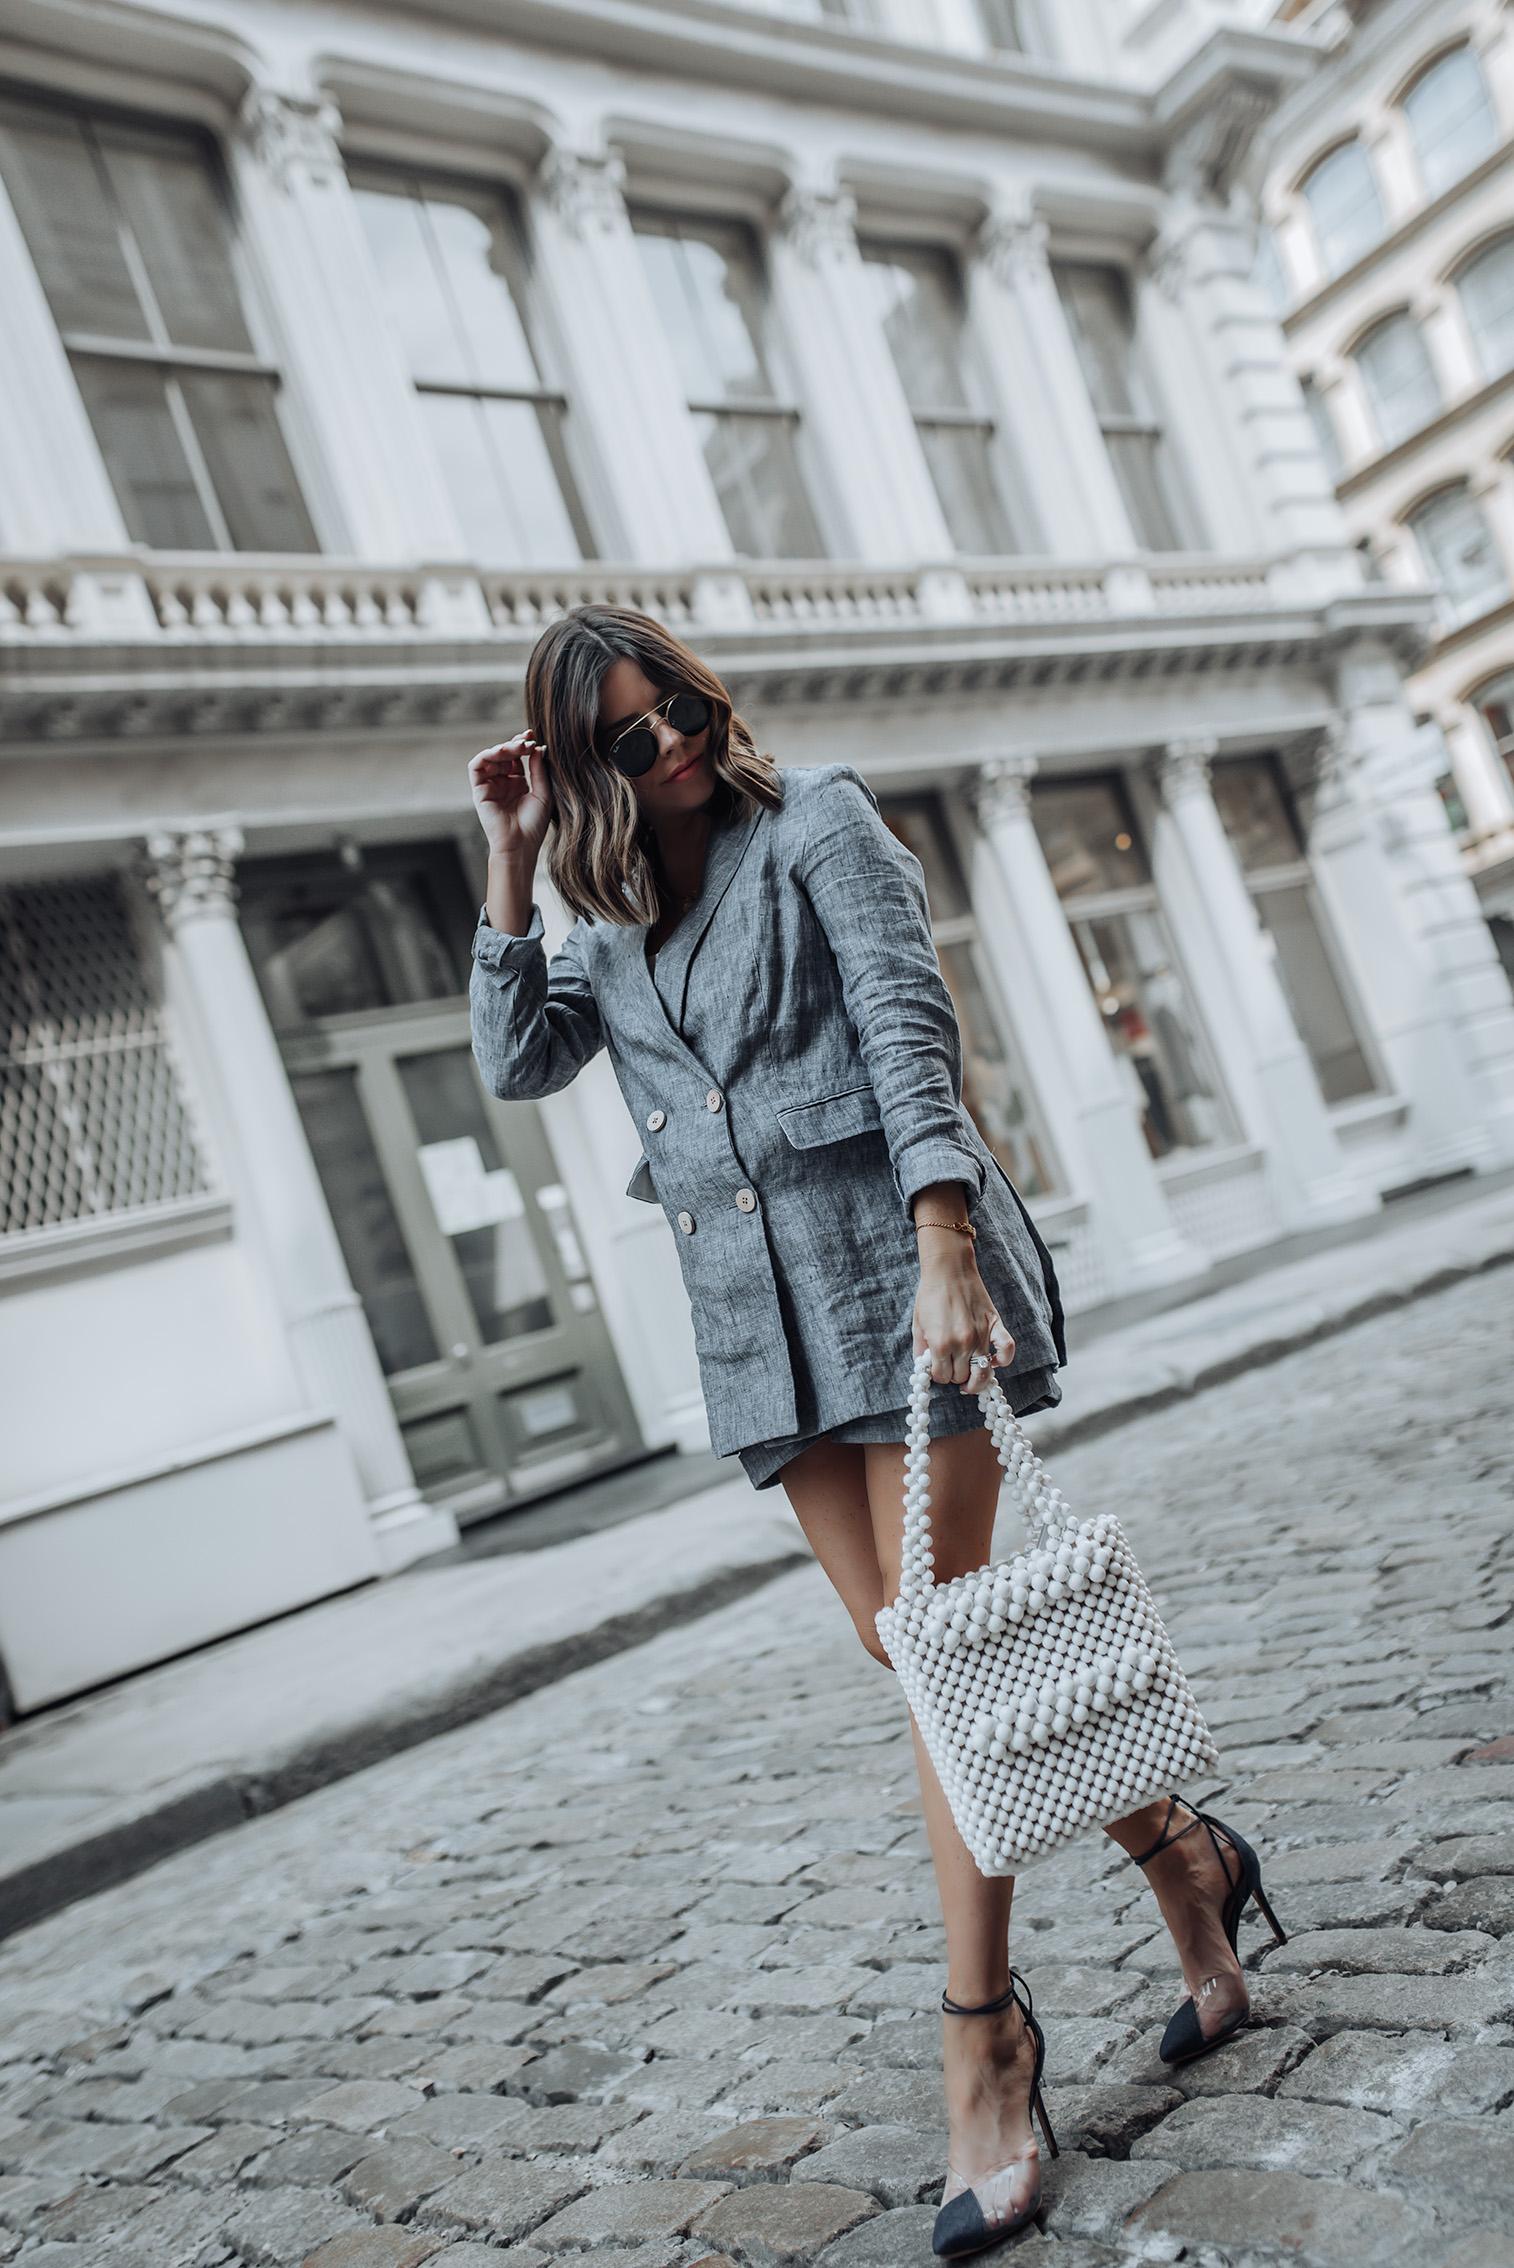 NYFW Day 1 |Mango Linen Blazer and Shorts (sold out) similar here & here | Schutz Shoes | Beaded Handbag #streetstyle #liketkit #beaded handbag #shrimpsbag